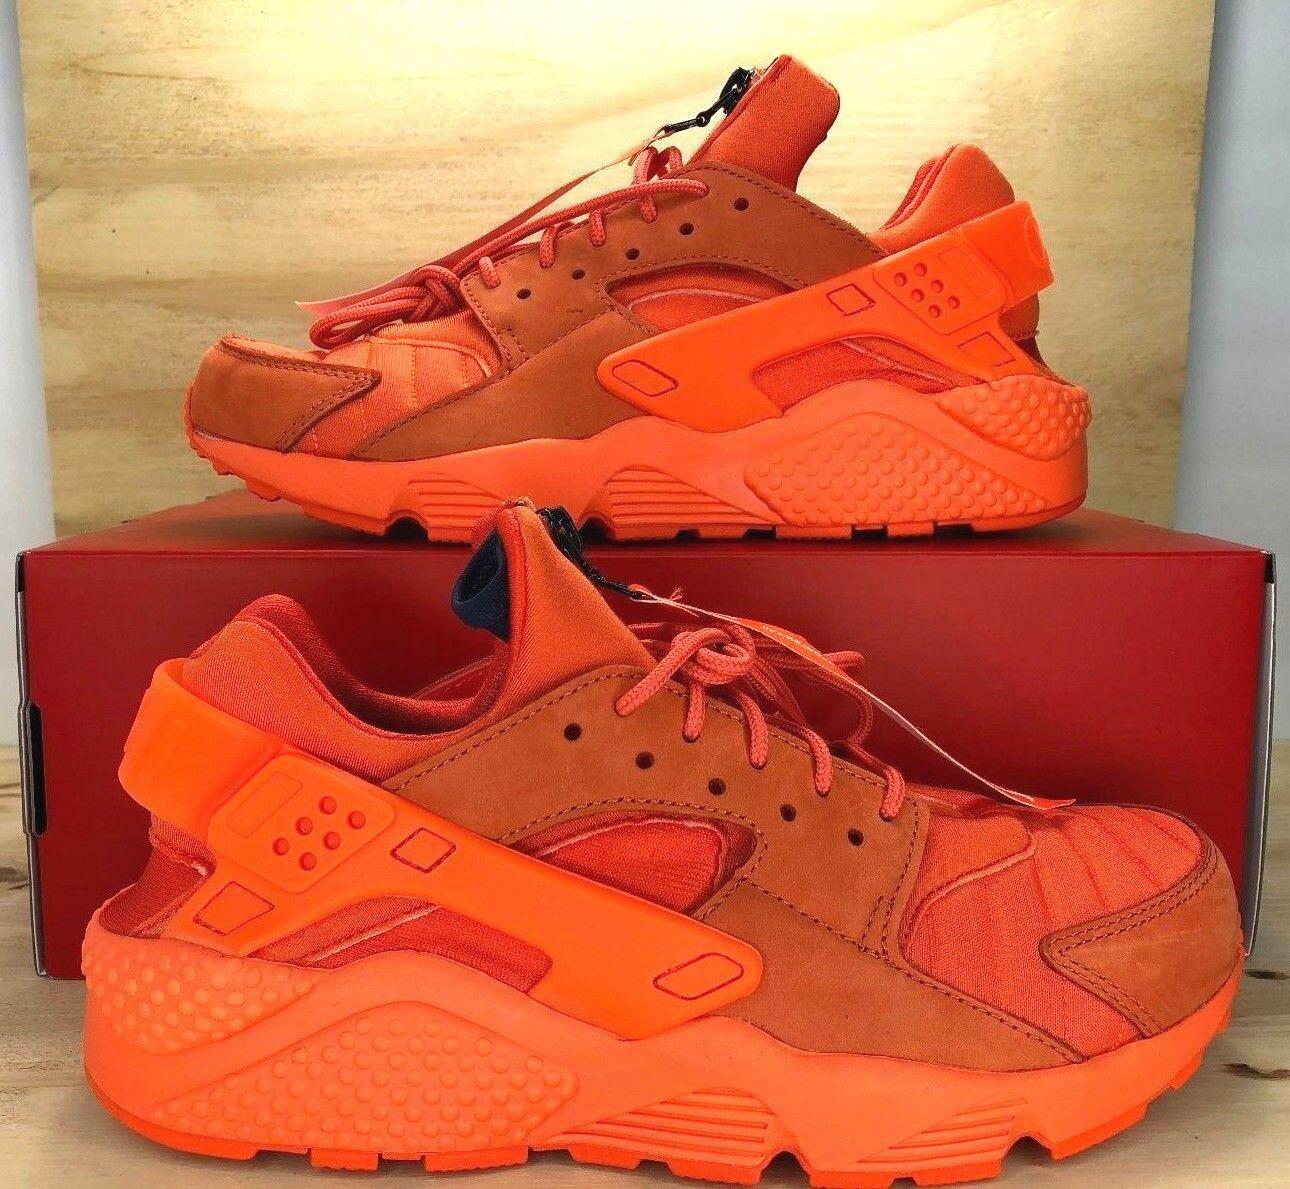 NIKE AIR HUARACHE QS CHICAGO Orange Blaze Sneaker AJ5578-800 Men's Shoes SZ 10.5